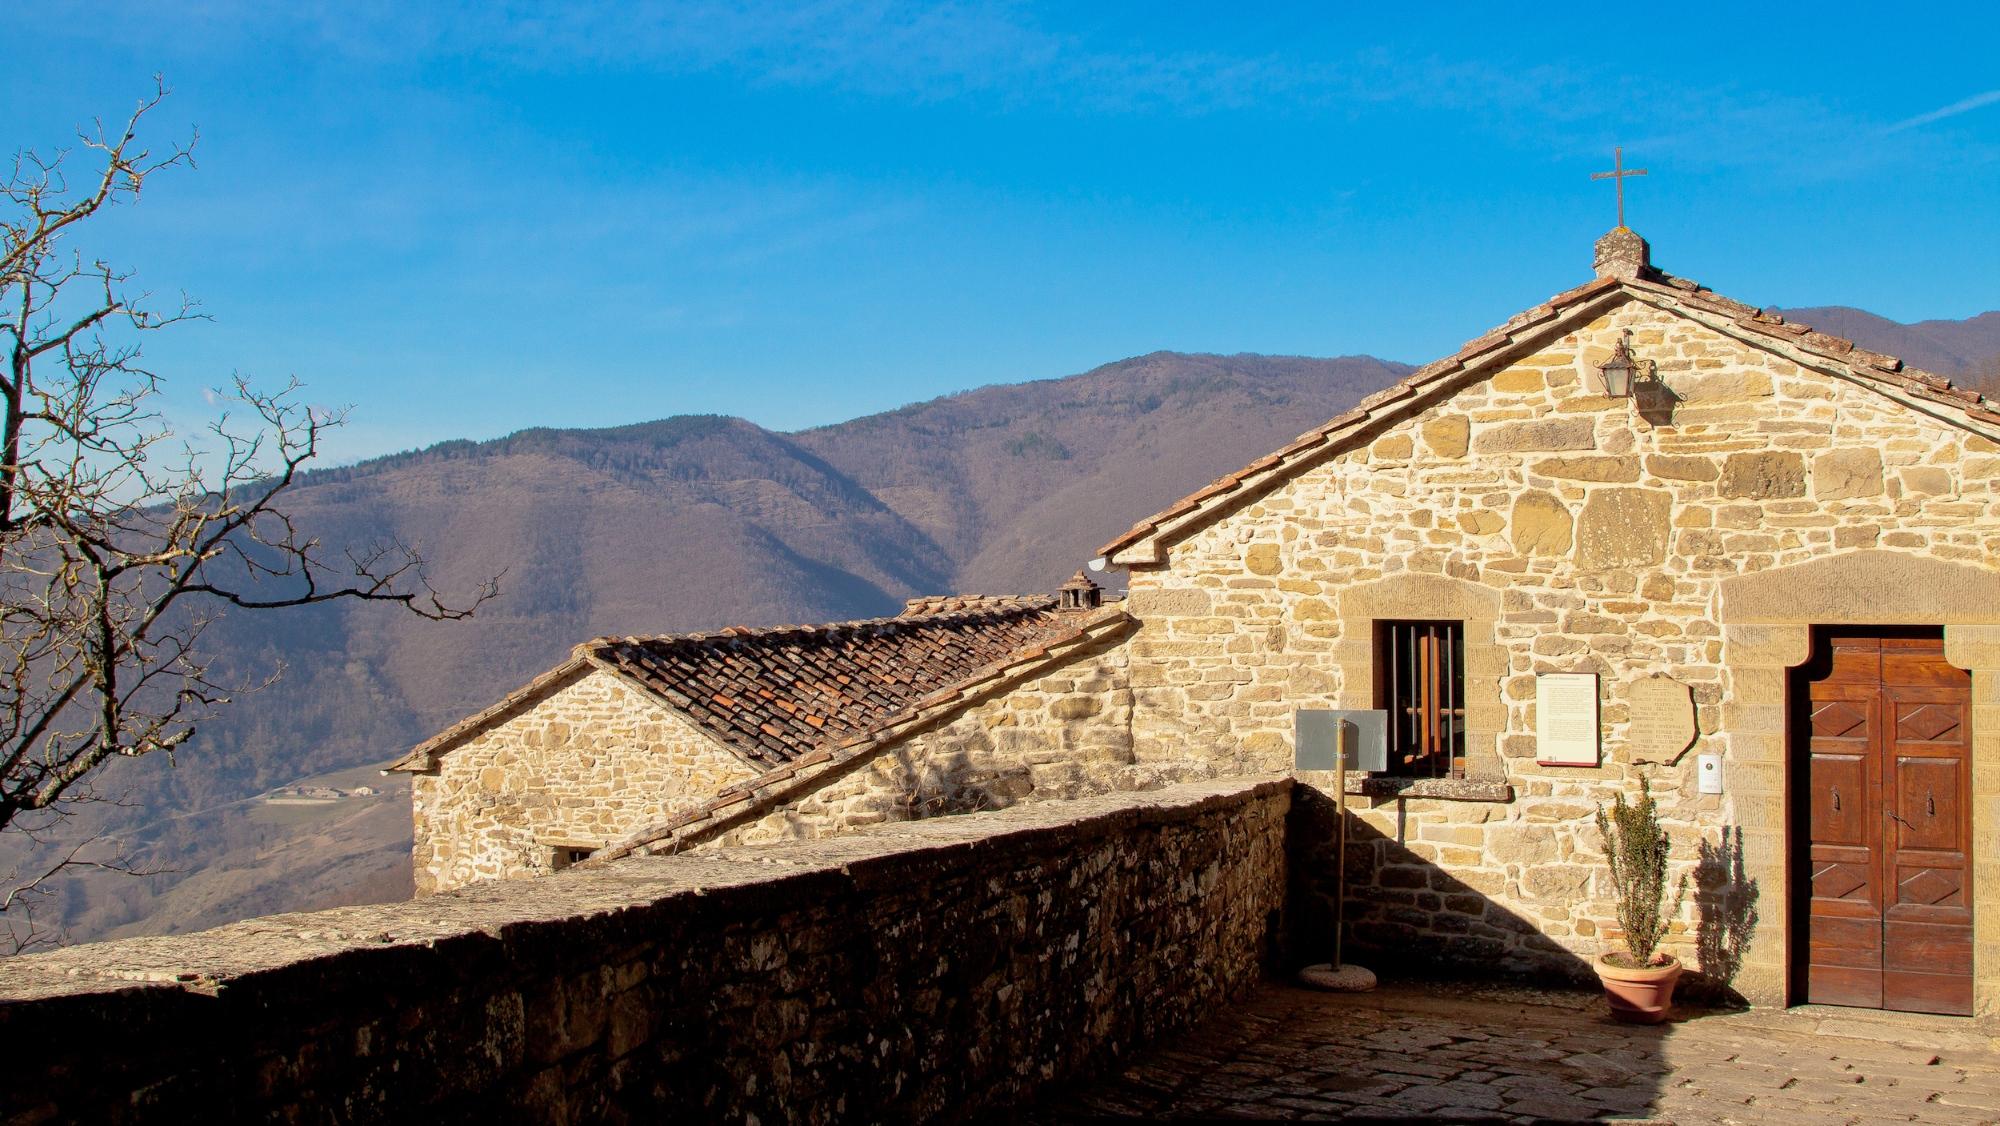 Sansepolcro - Pieve Santo Stefano